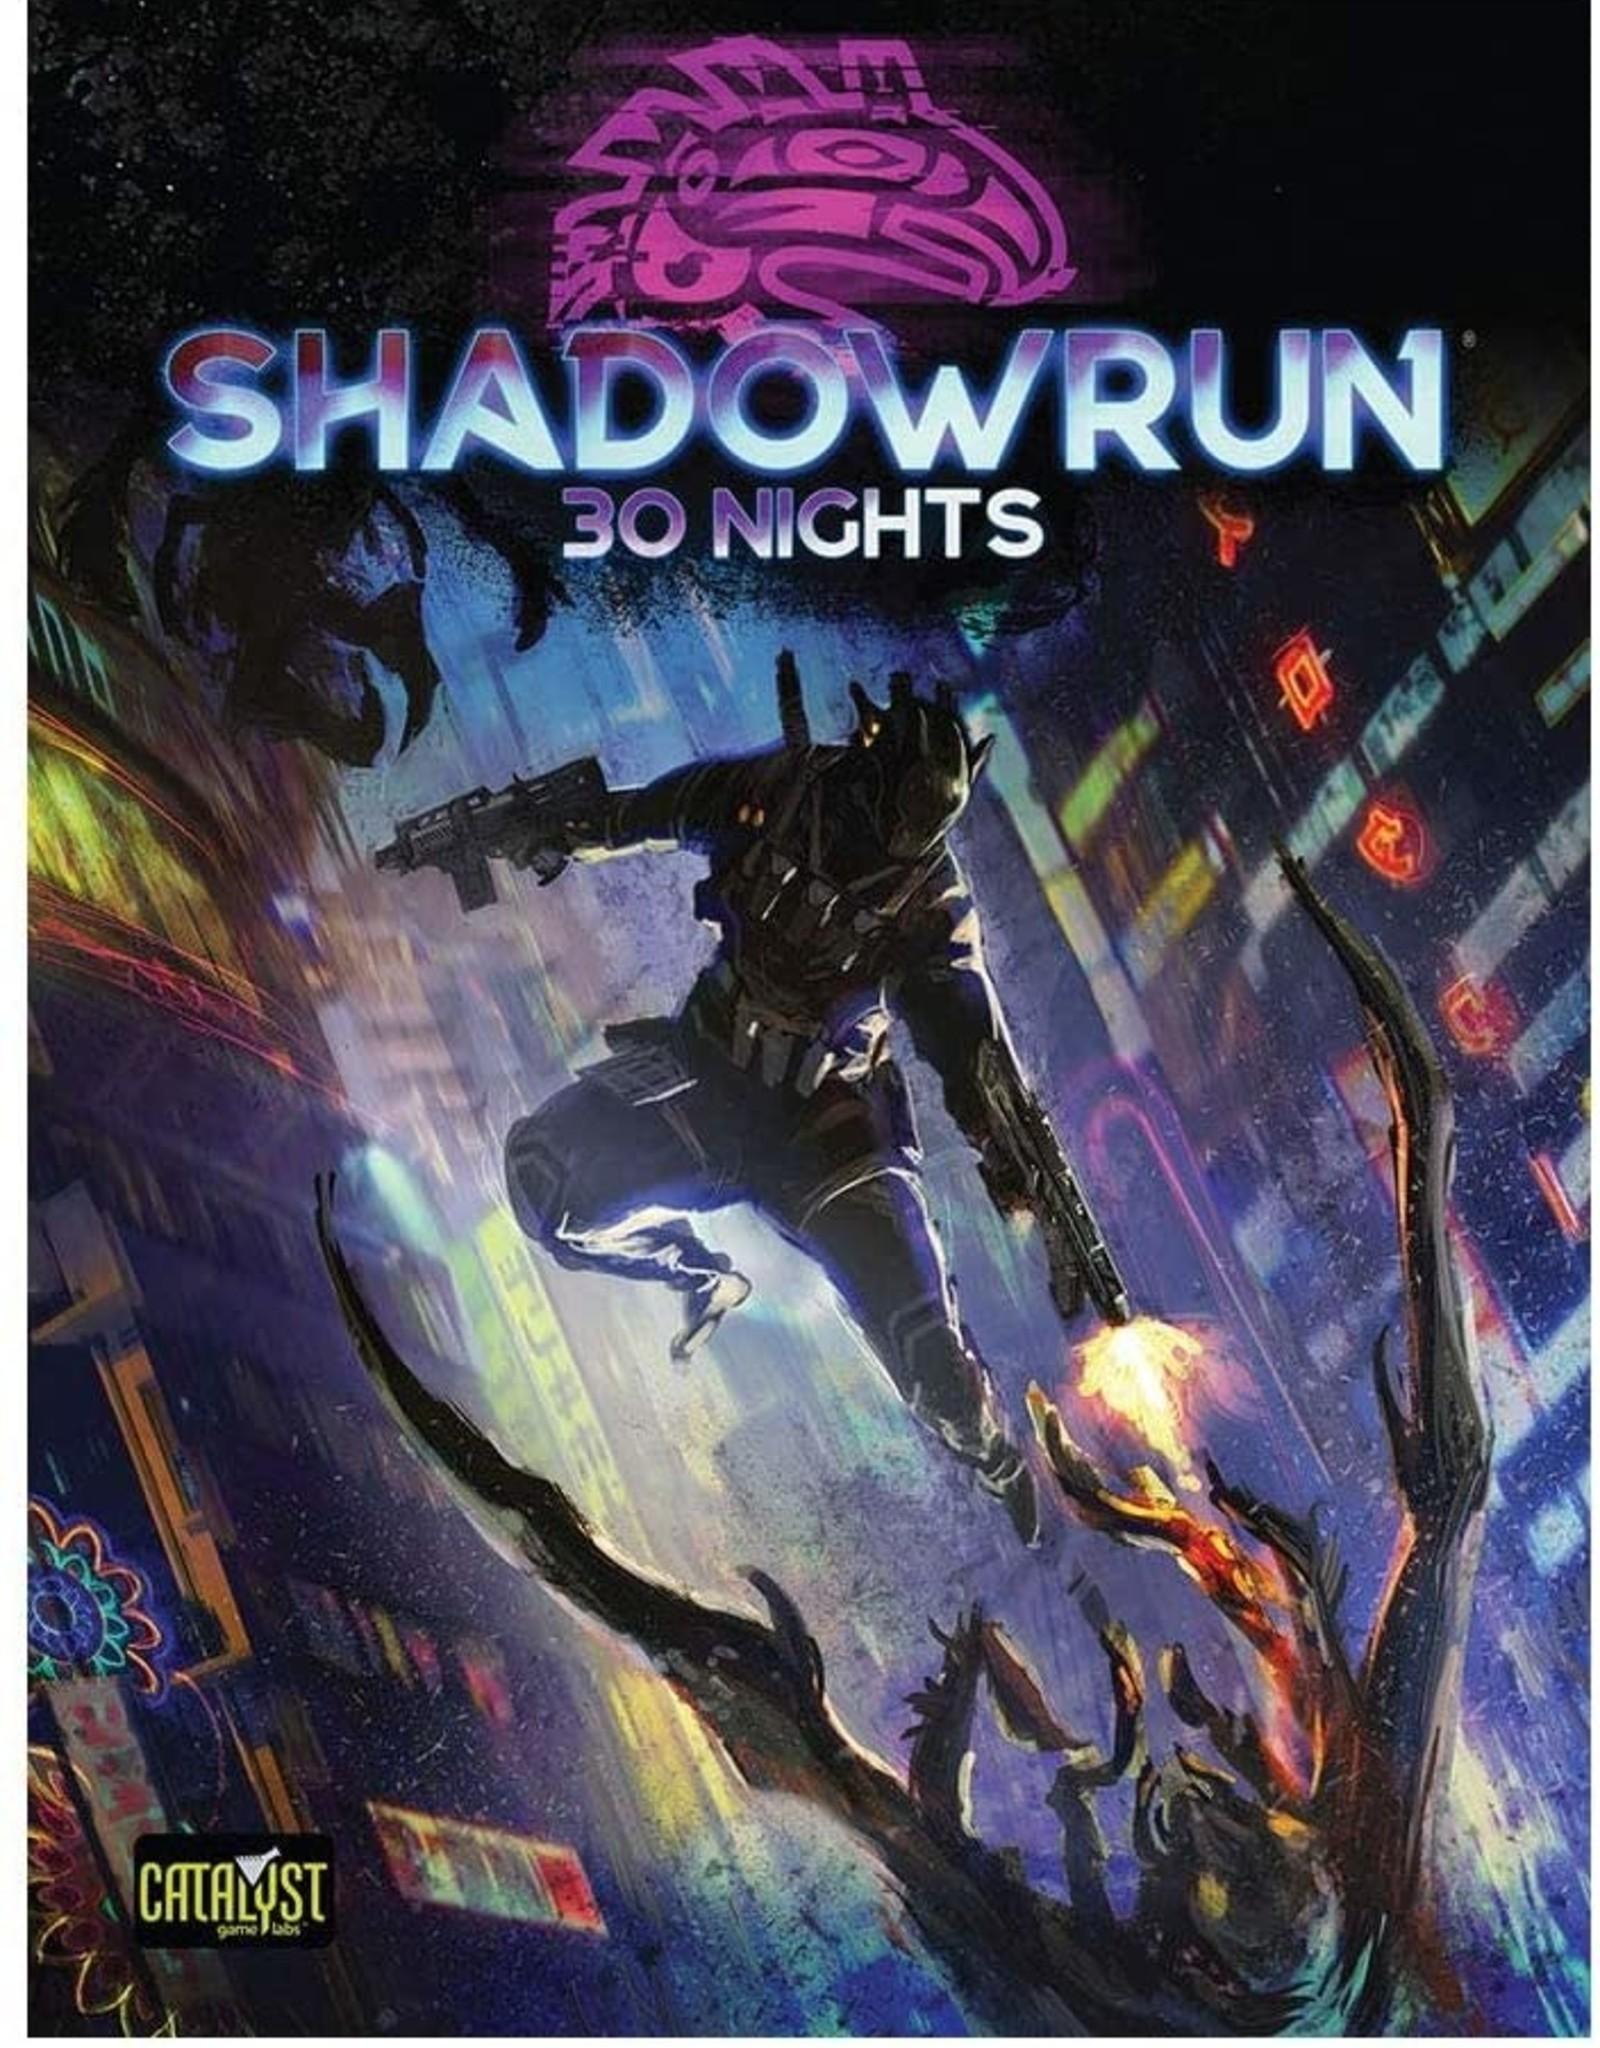 Shadowrun 30 Nights Campaign